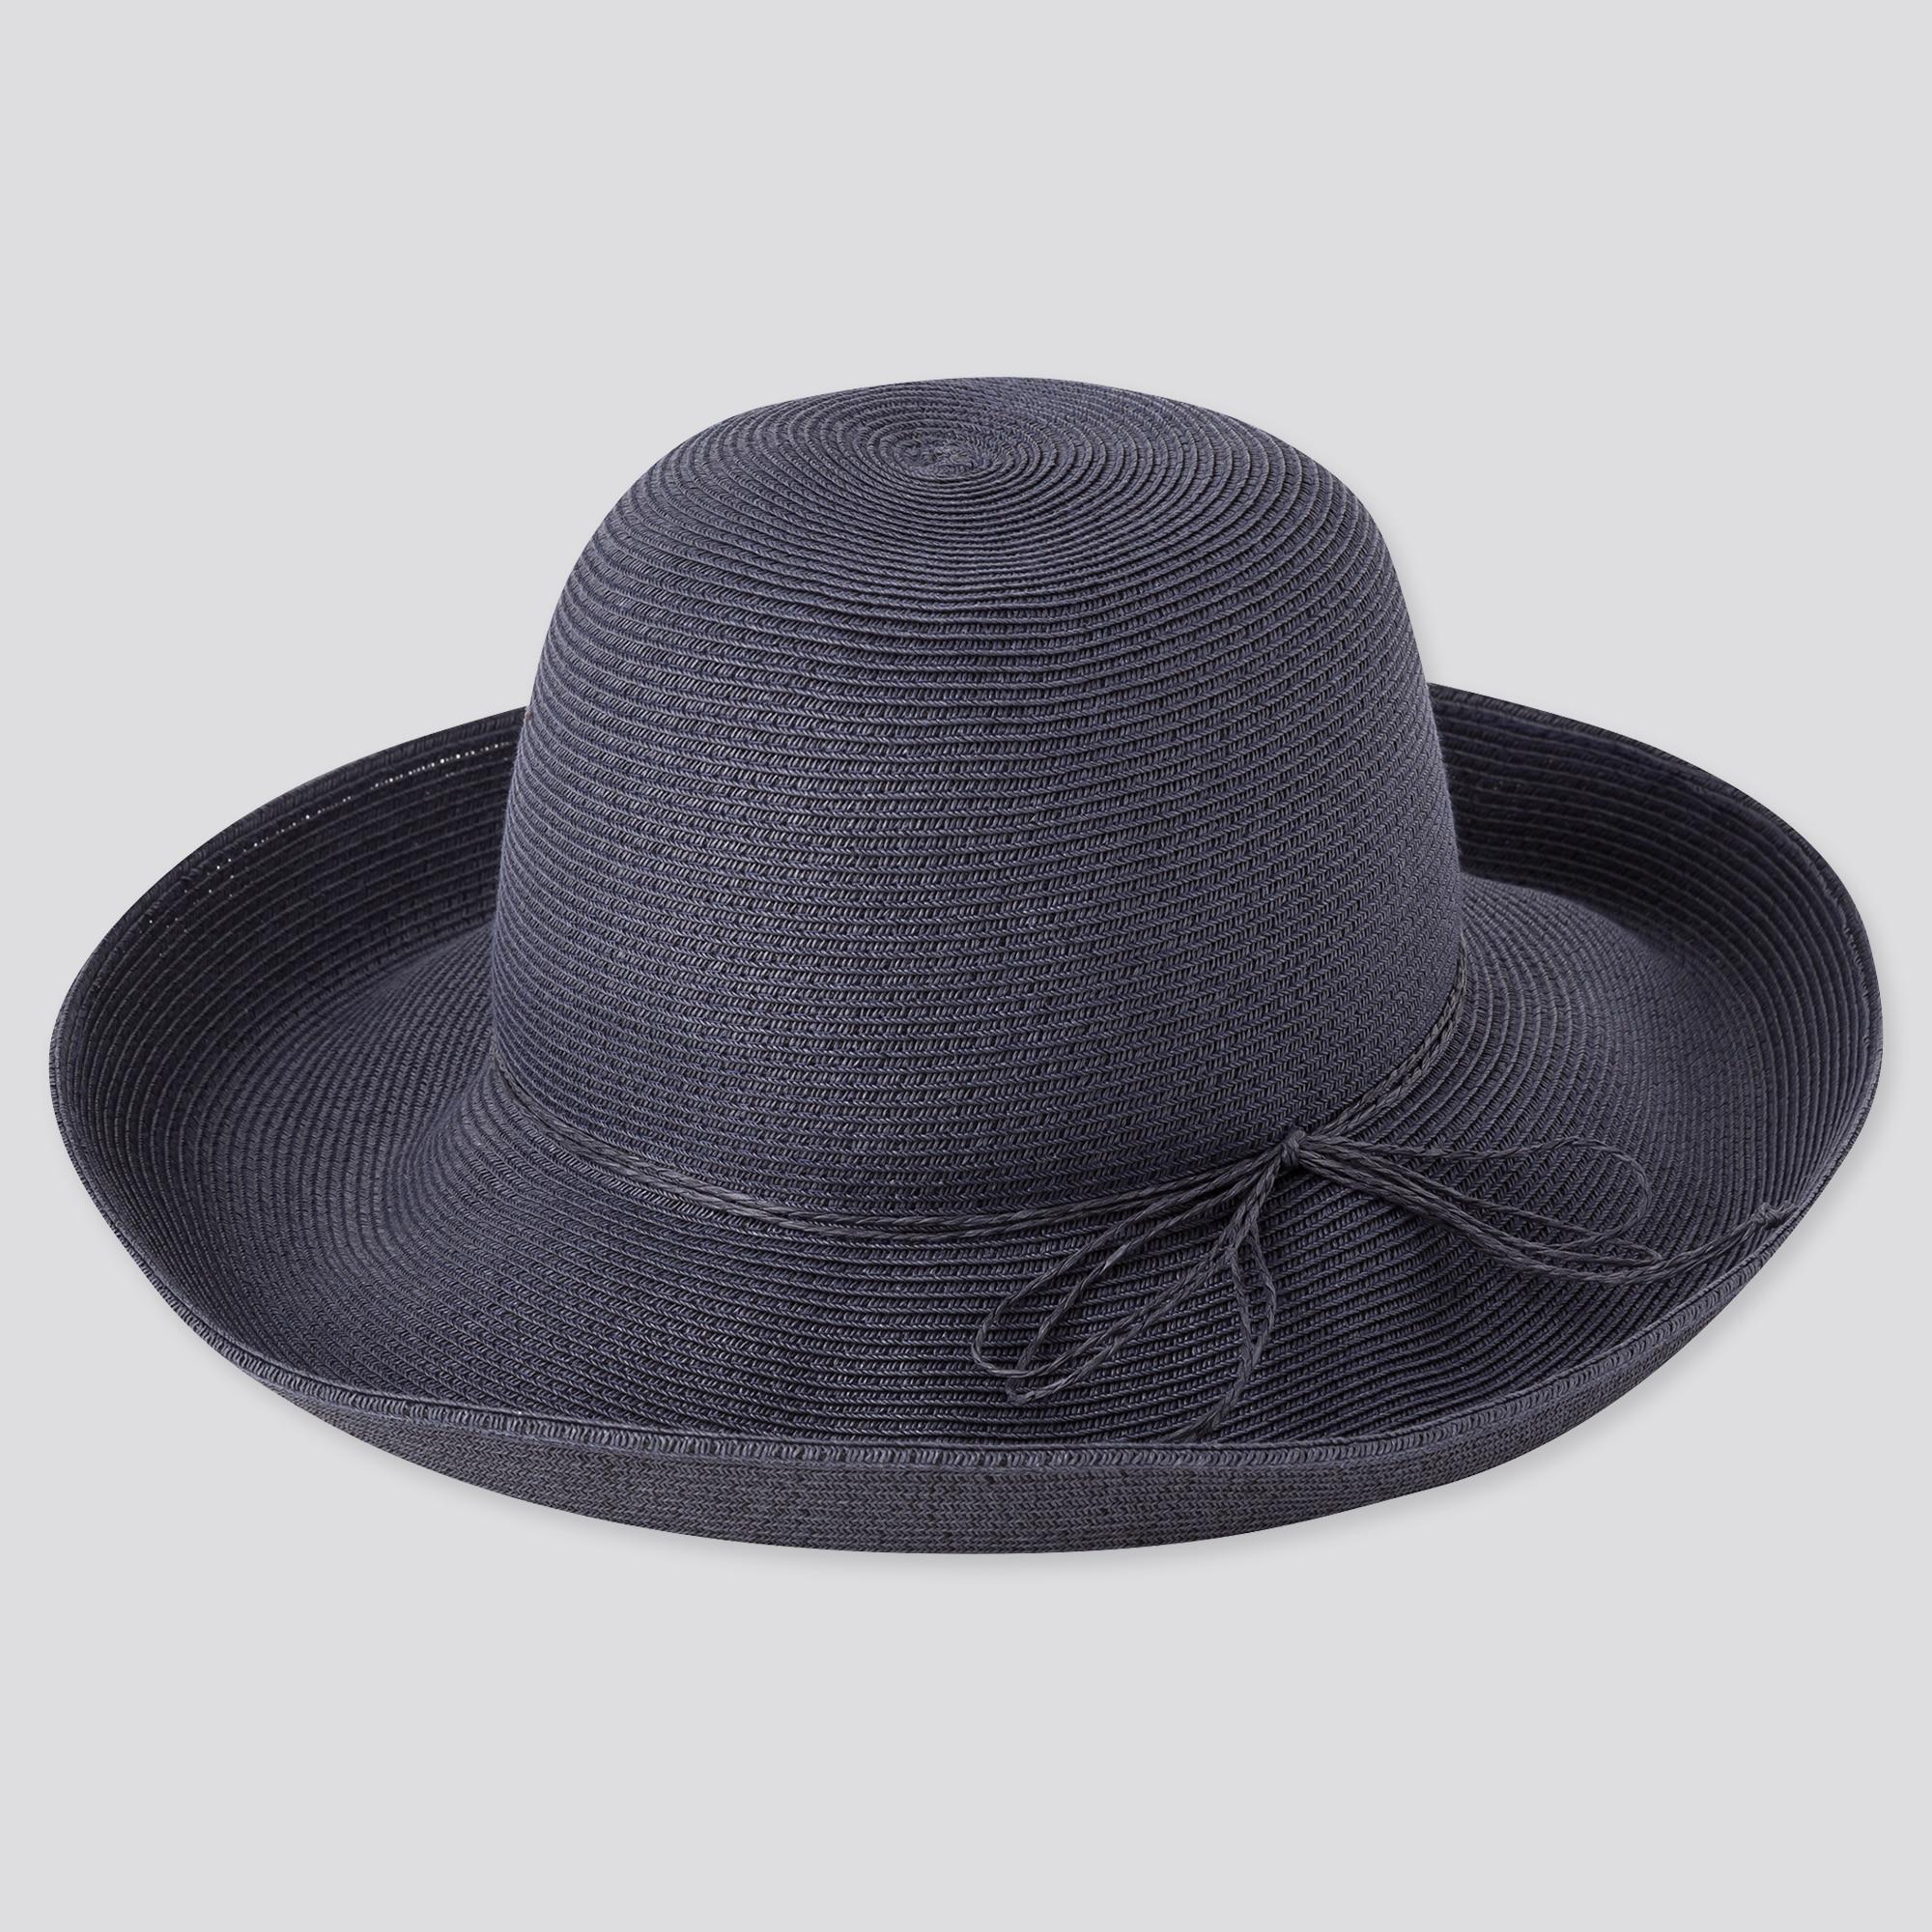 WOMEN UV PROTECTION ADJUSTABLE PAPER CAPELINE HAT